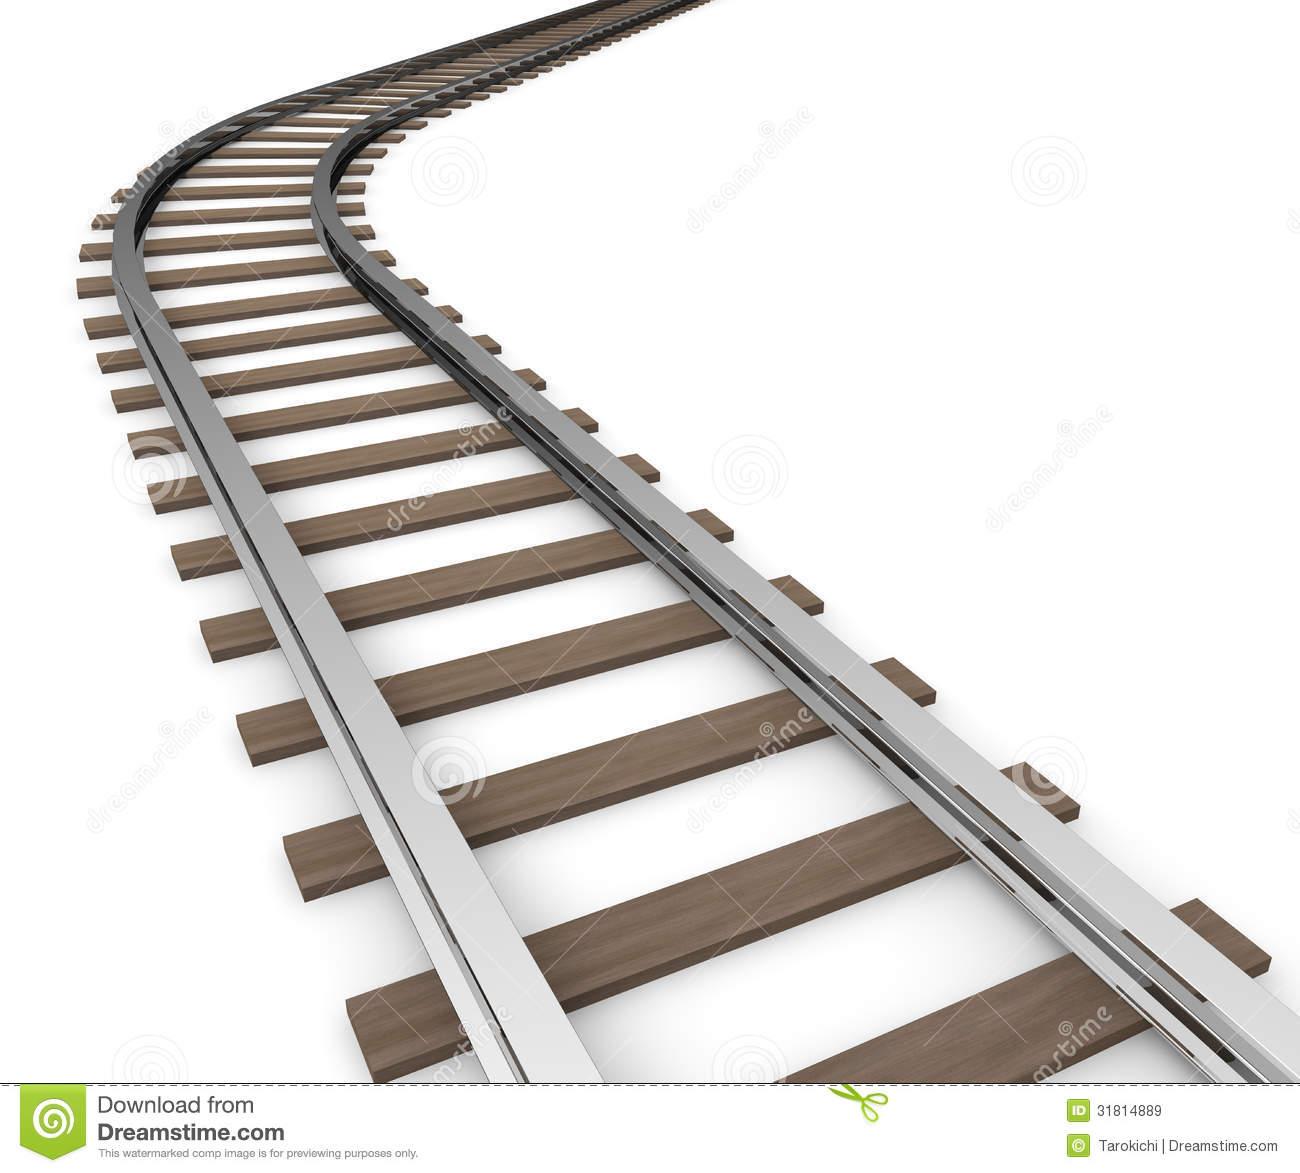 Train line clipart.